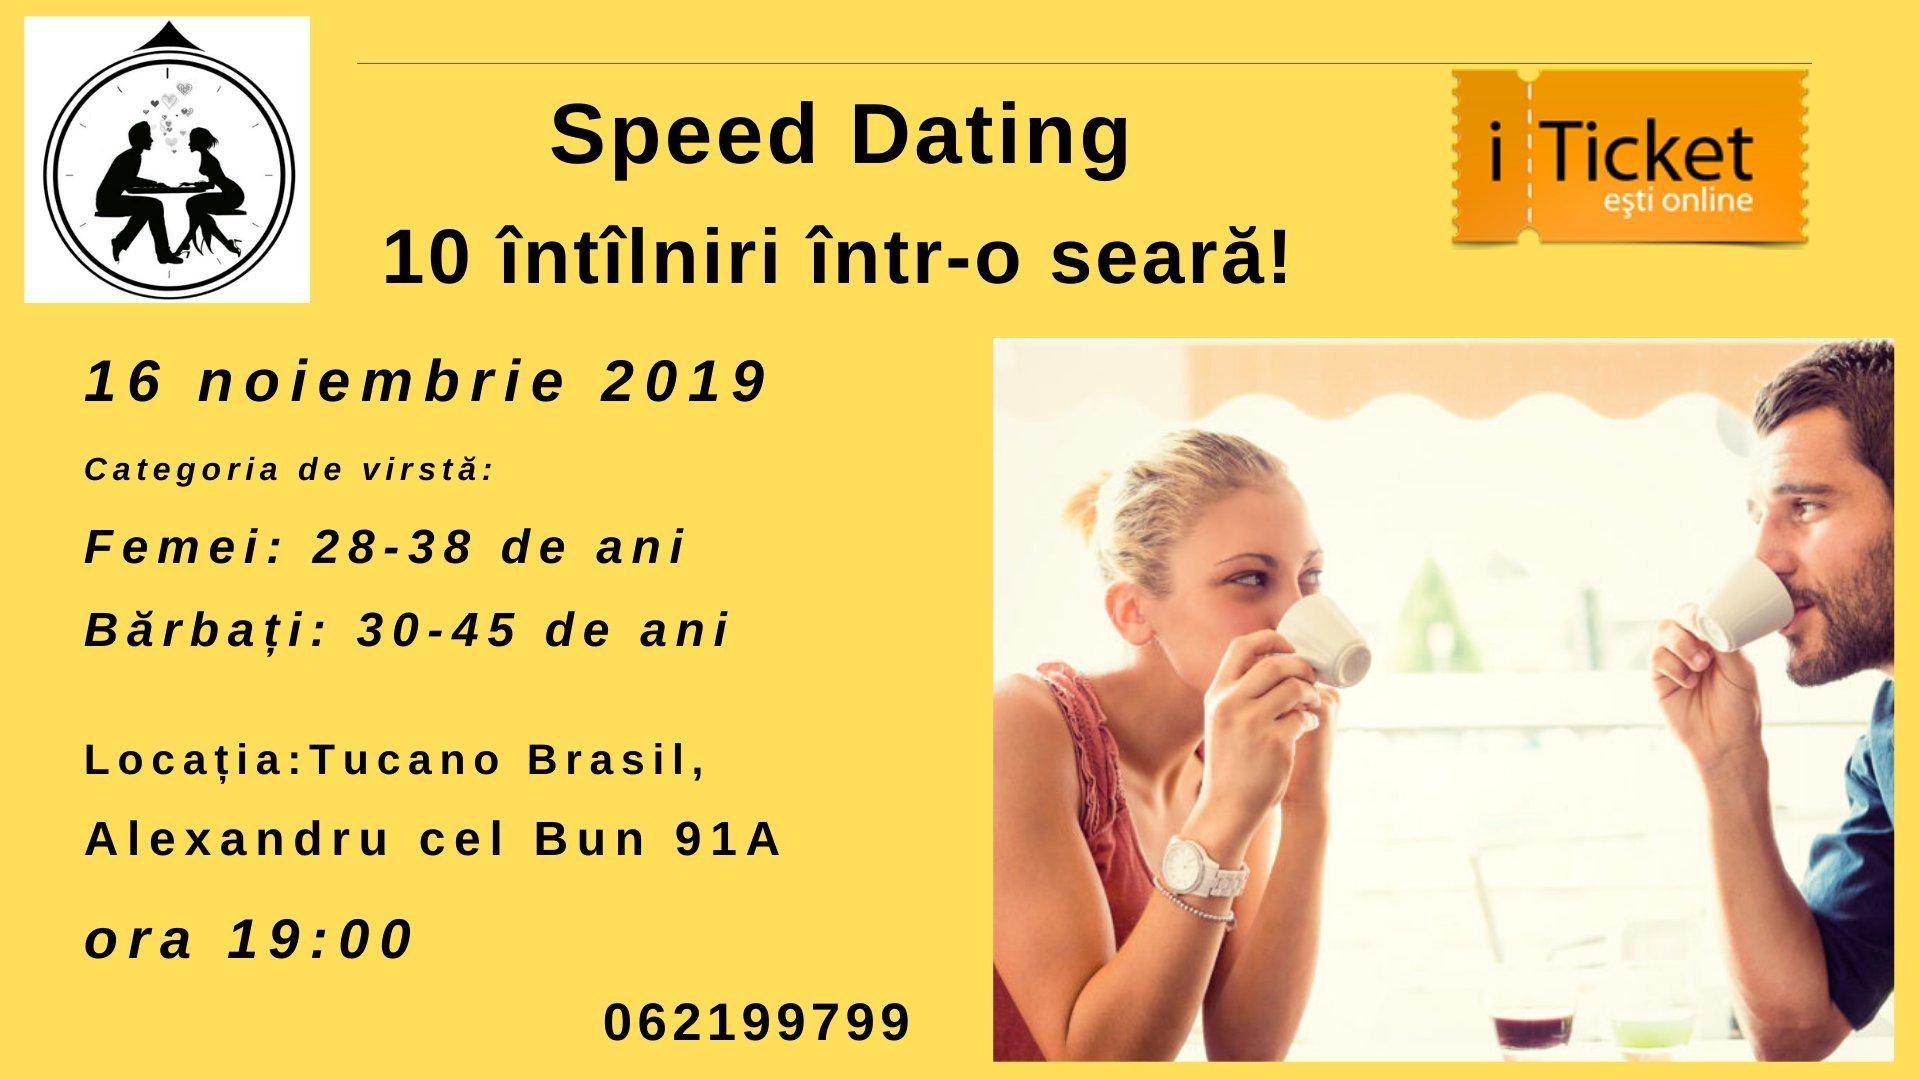 Brasil speed dating dating sites Tupelo MS